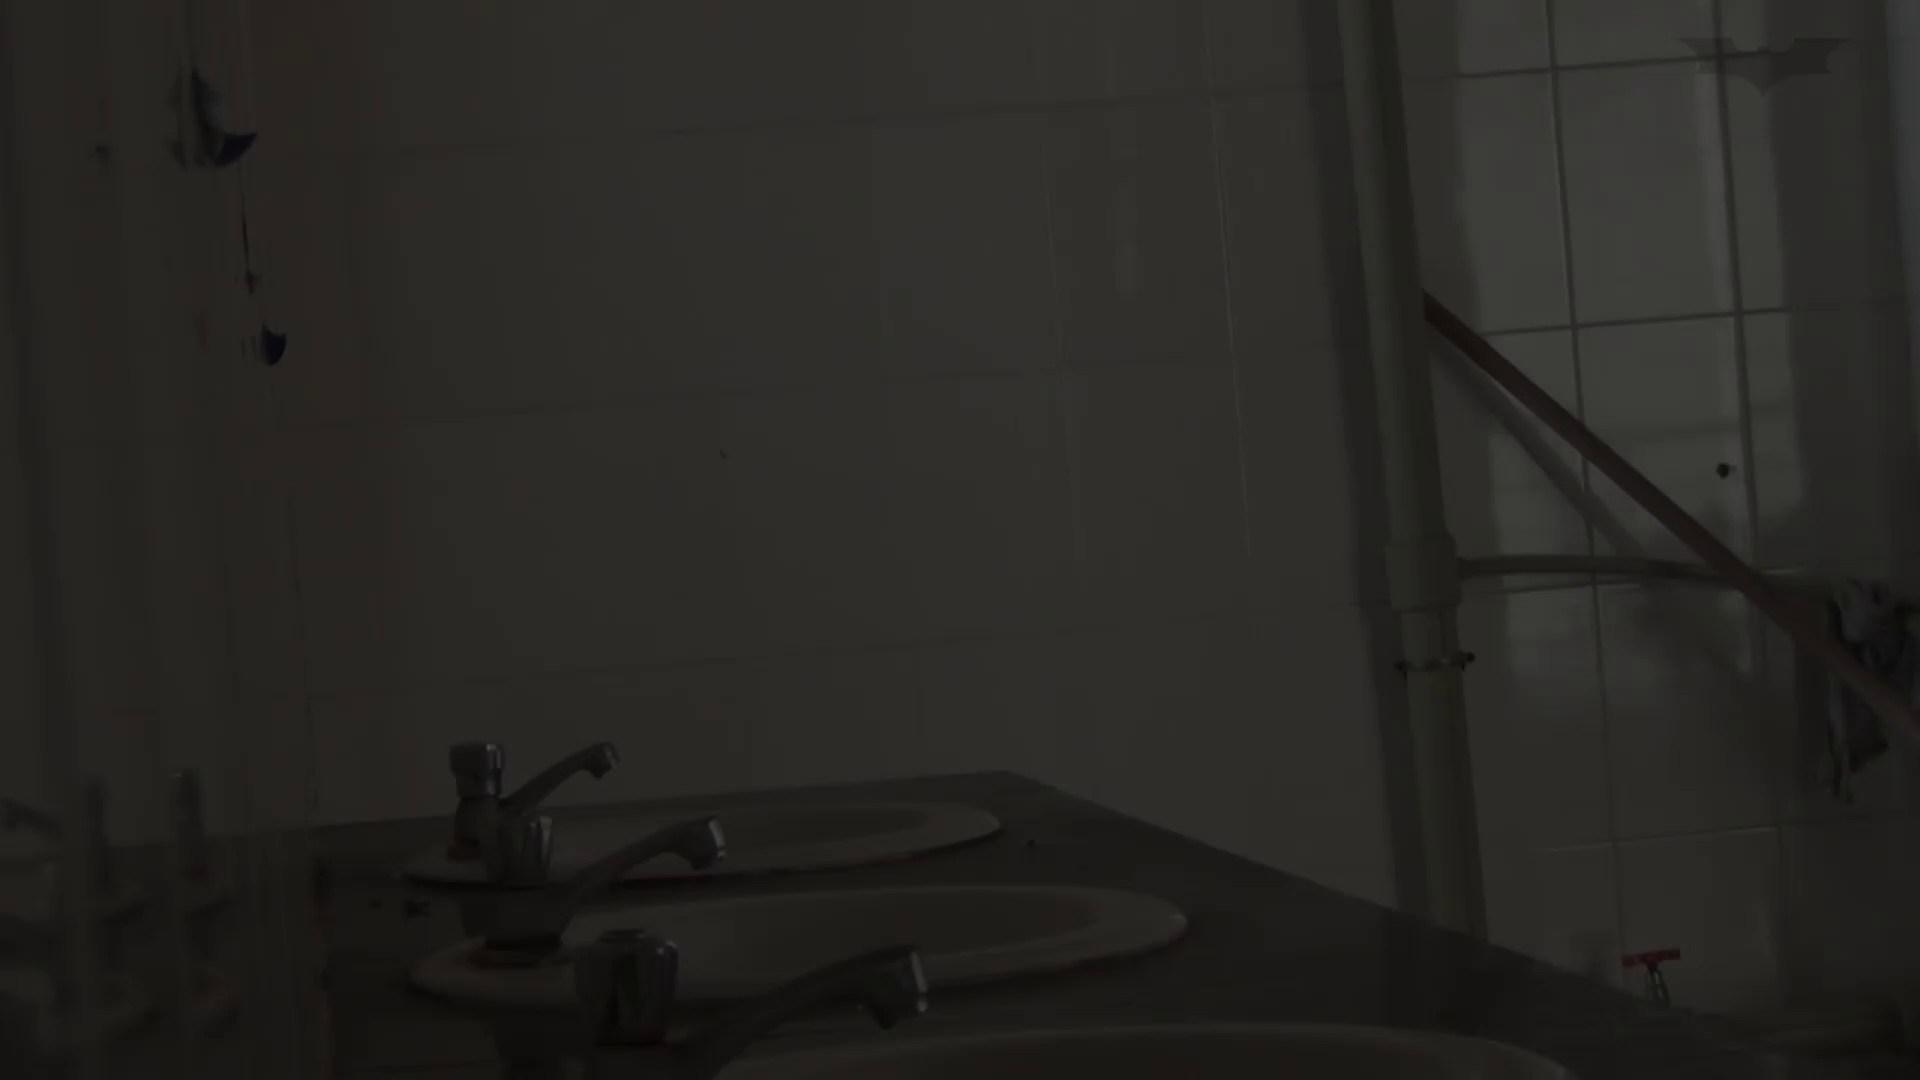 JD盗撮 美女の洗面所の秘密 Vol.47 美肌 エロ無料画像 108画像 4